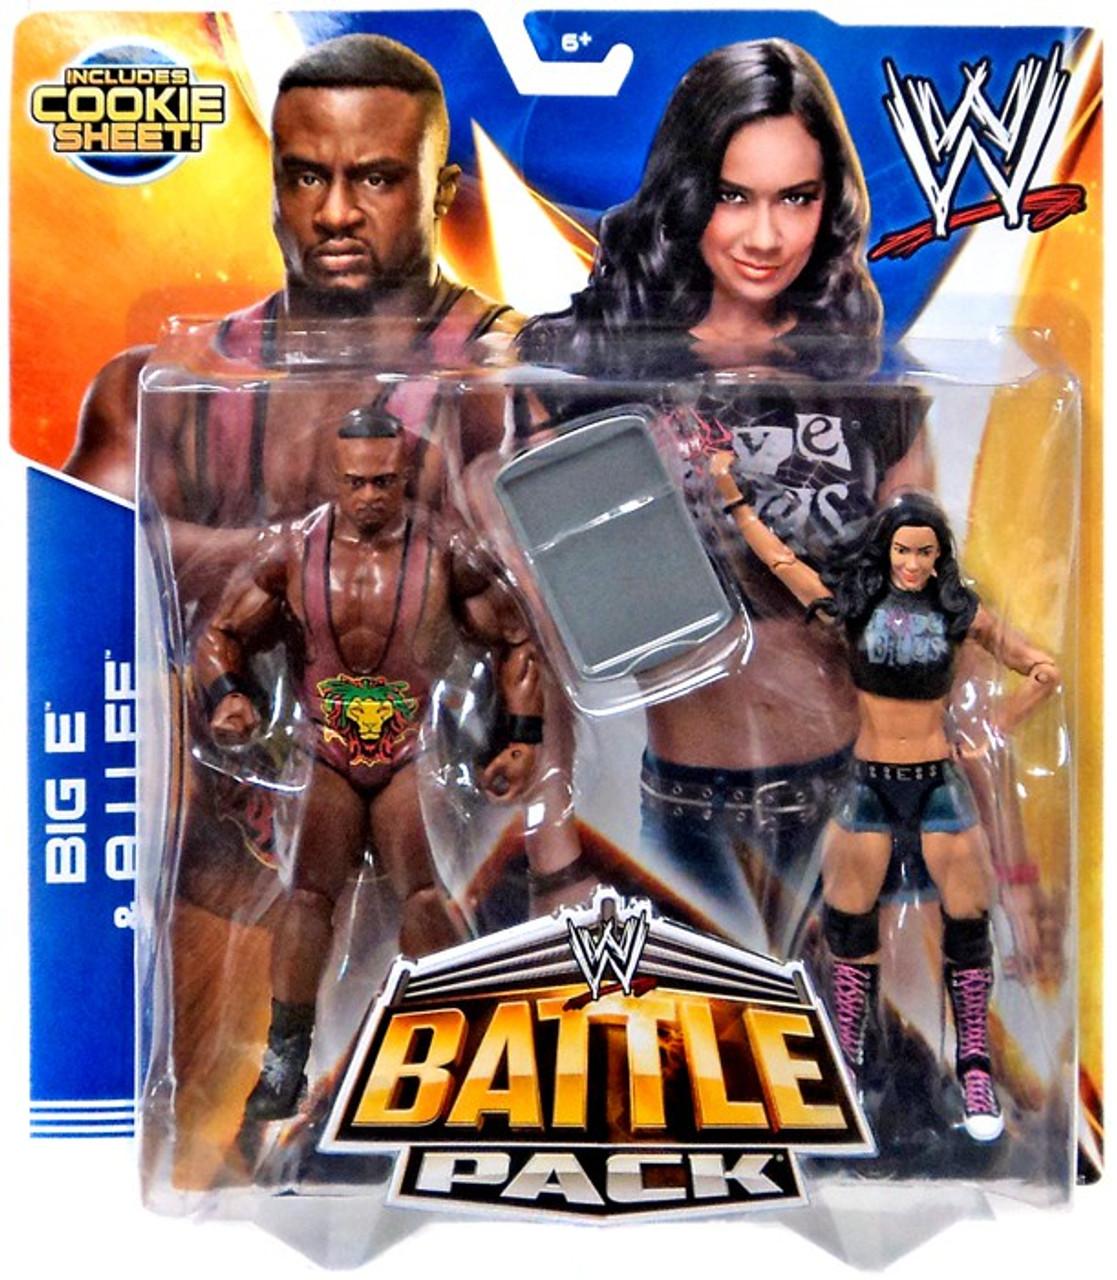 WWE Wrestling Series 28 AJ Lee & Big E Langston Action Figure 2-Pack [Cookie Sheet]